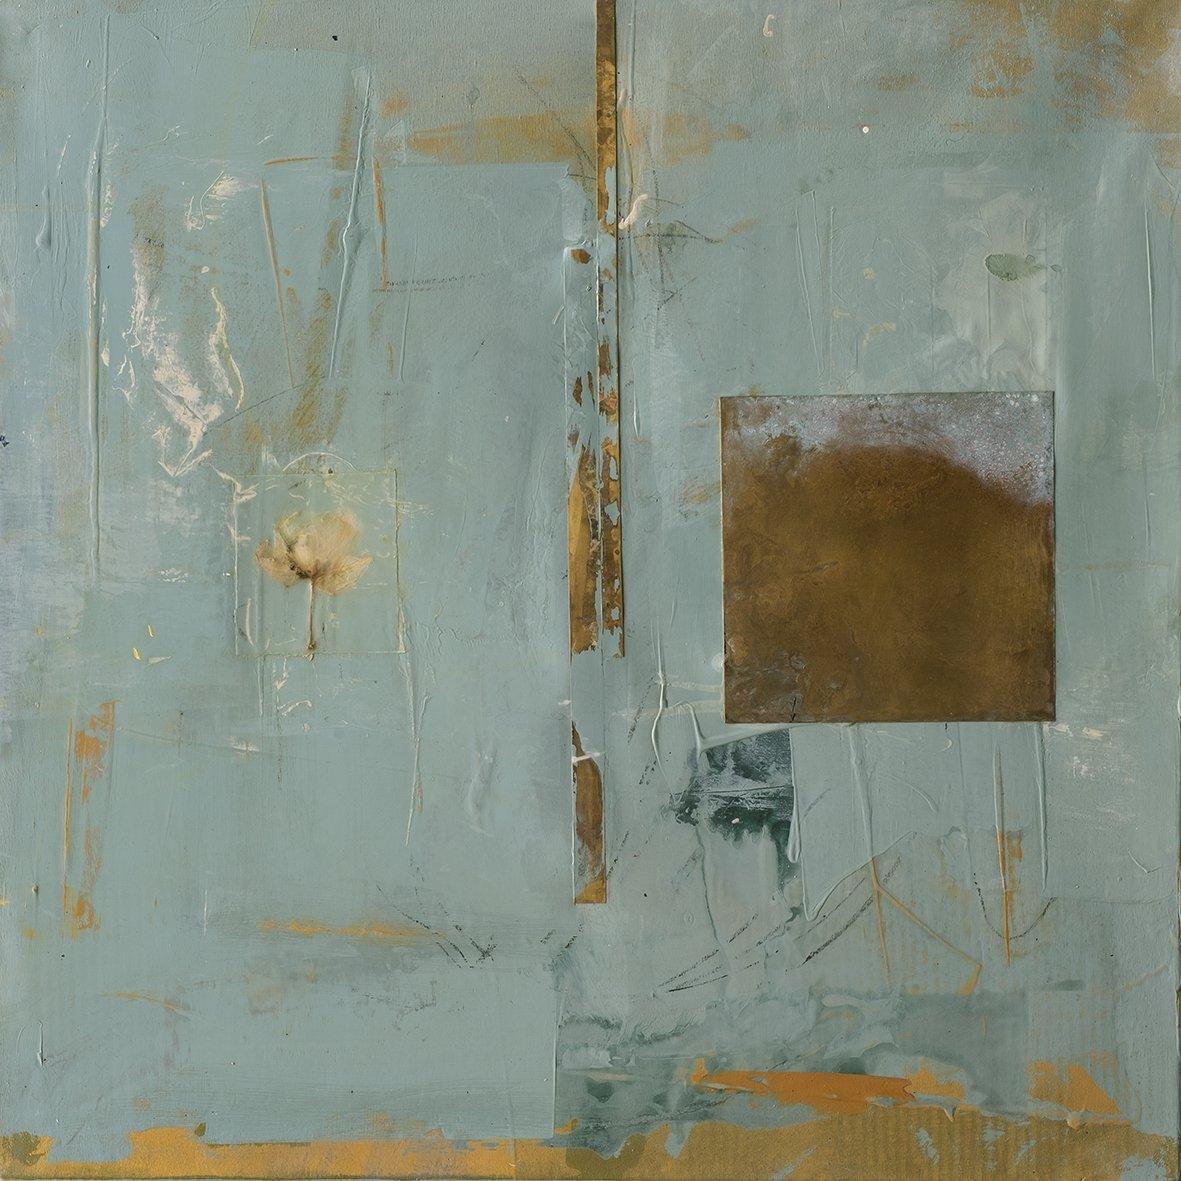 Kirkor Sahakoğlu, untitled, mix media on canvas, 60 by 60 centimeters.